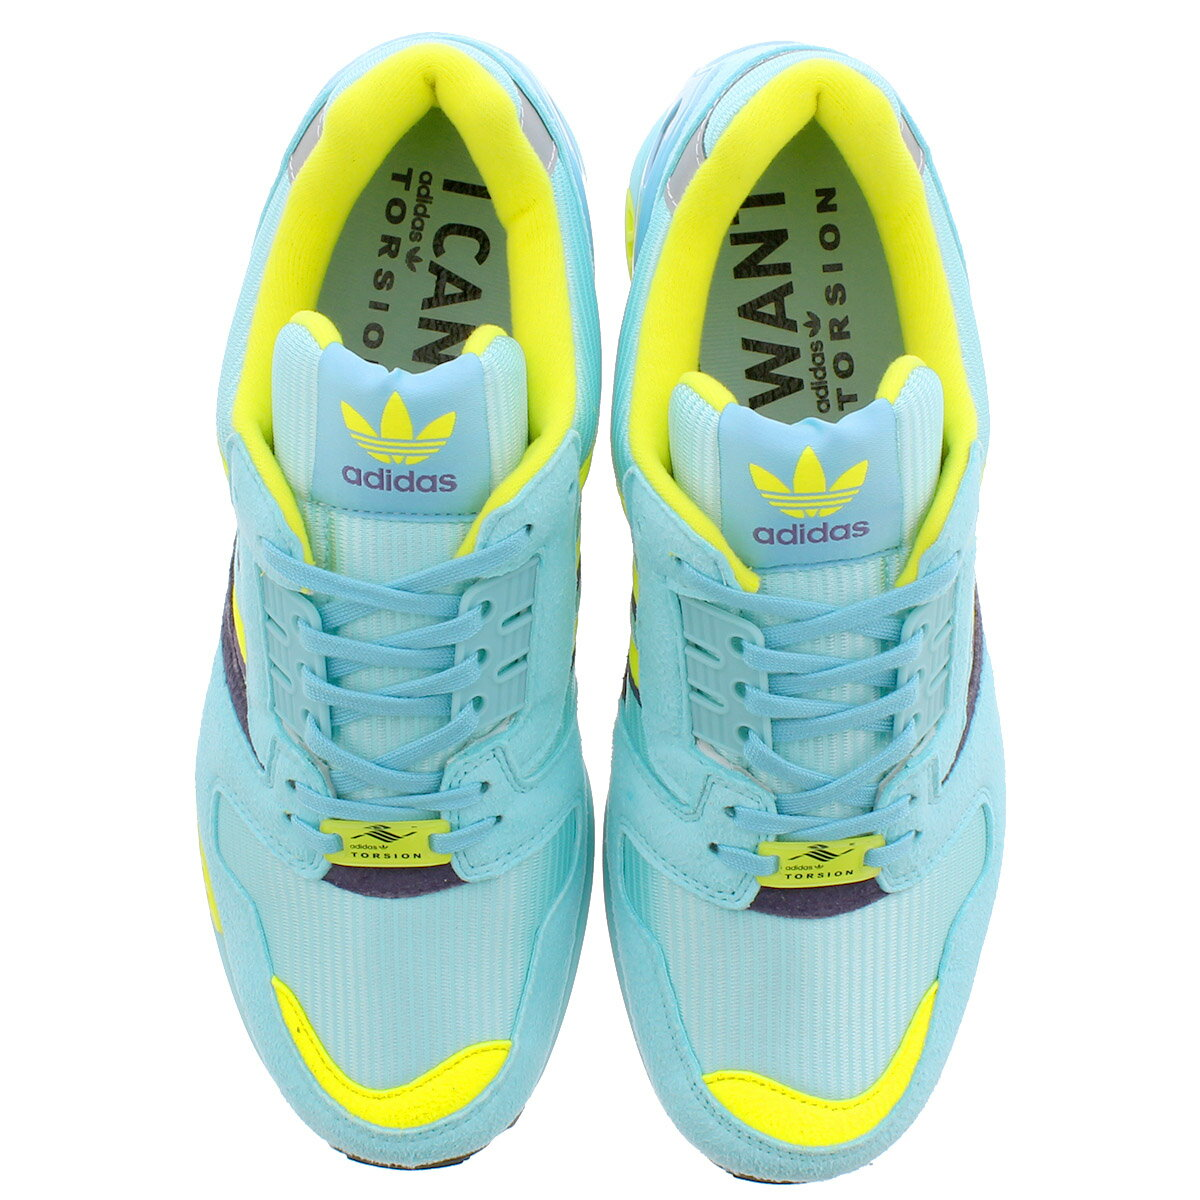 Adidas | Herren Turnschuhe Discount Preis Adidas ZX 8000